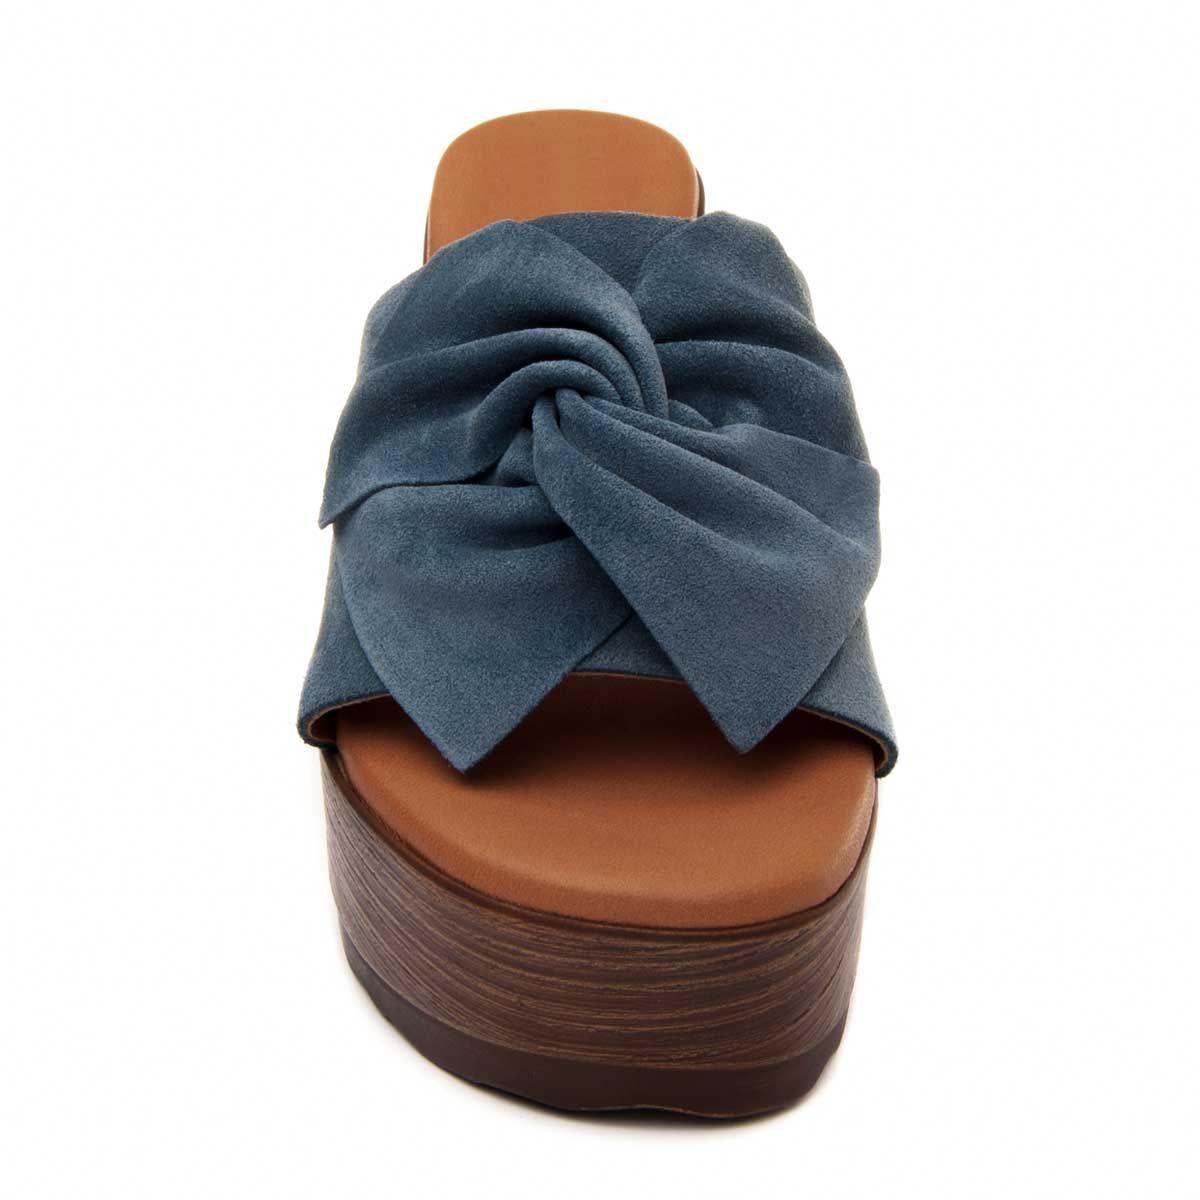 Montevita Platform Sandal in Blue